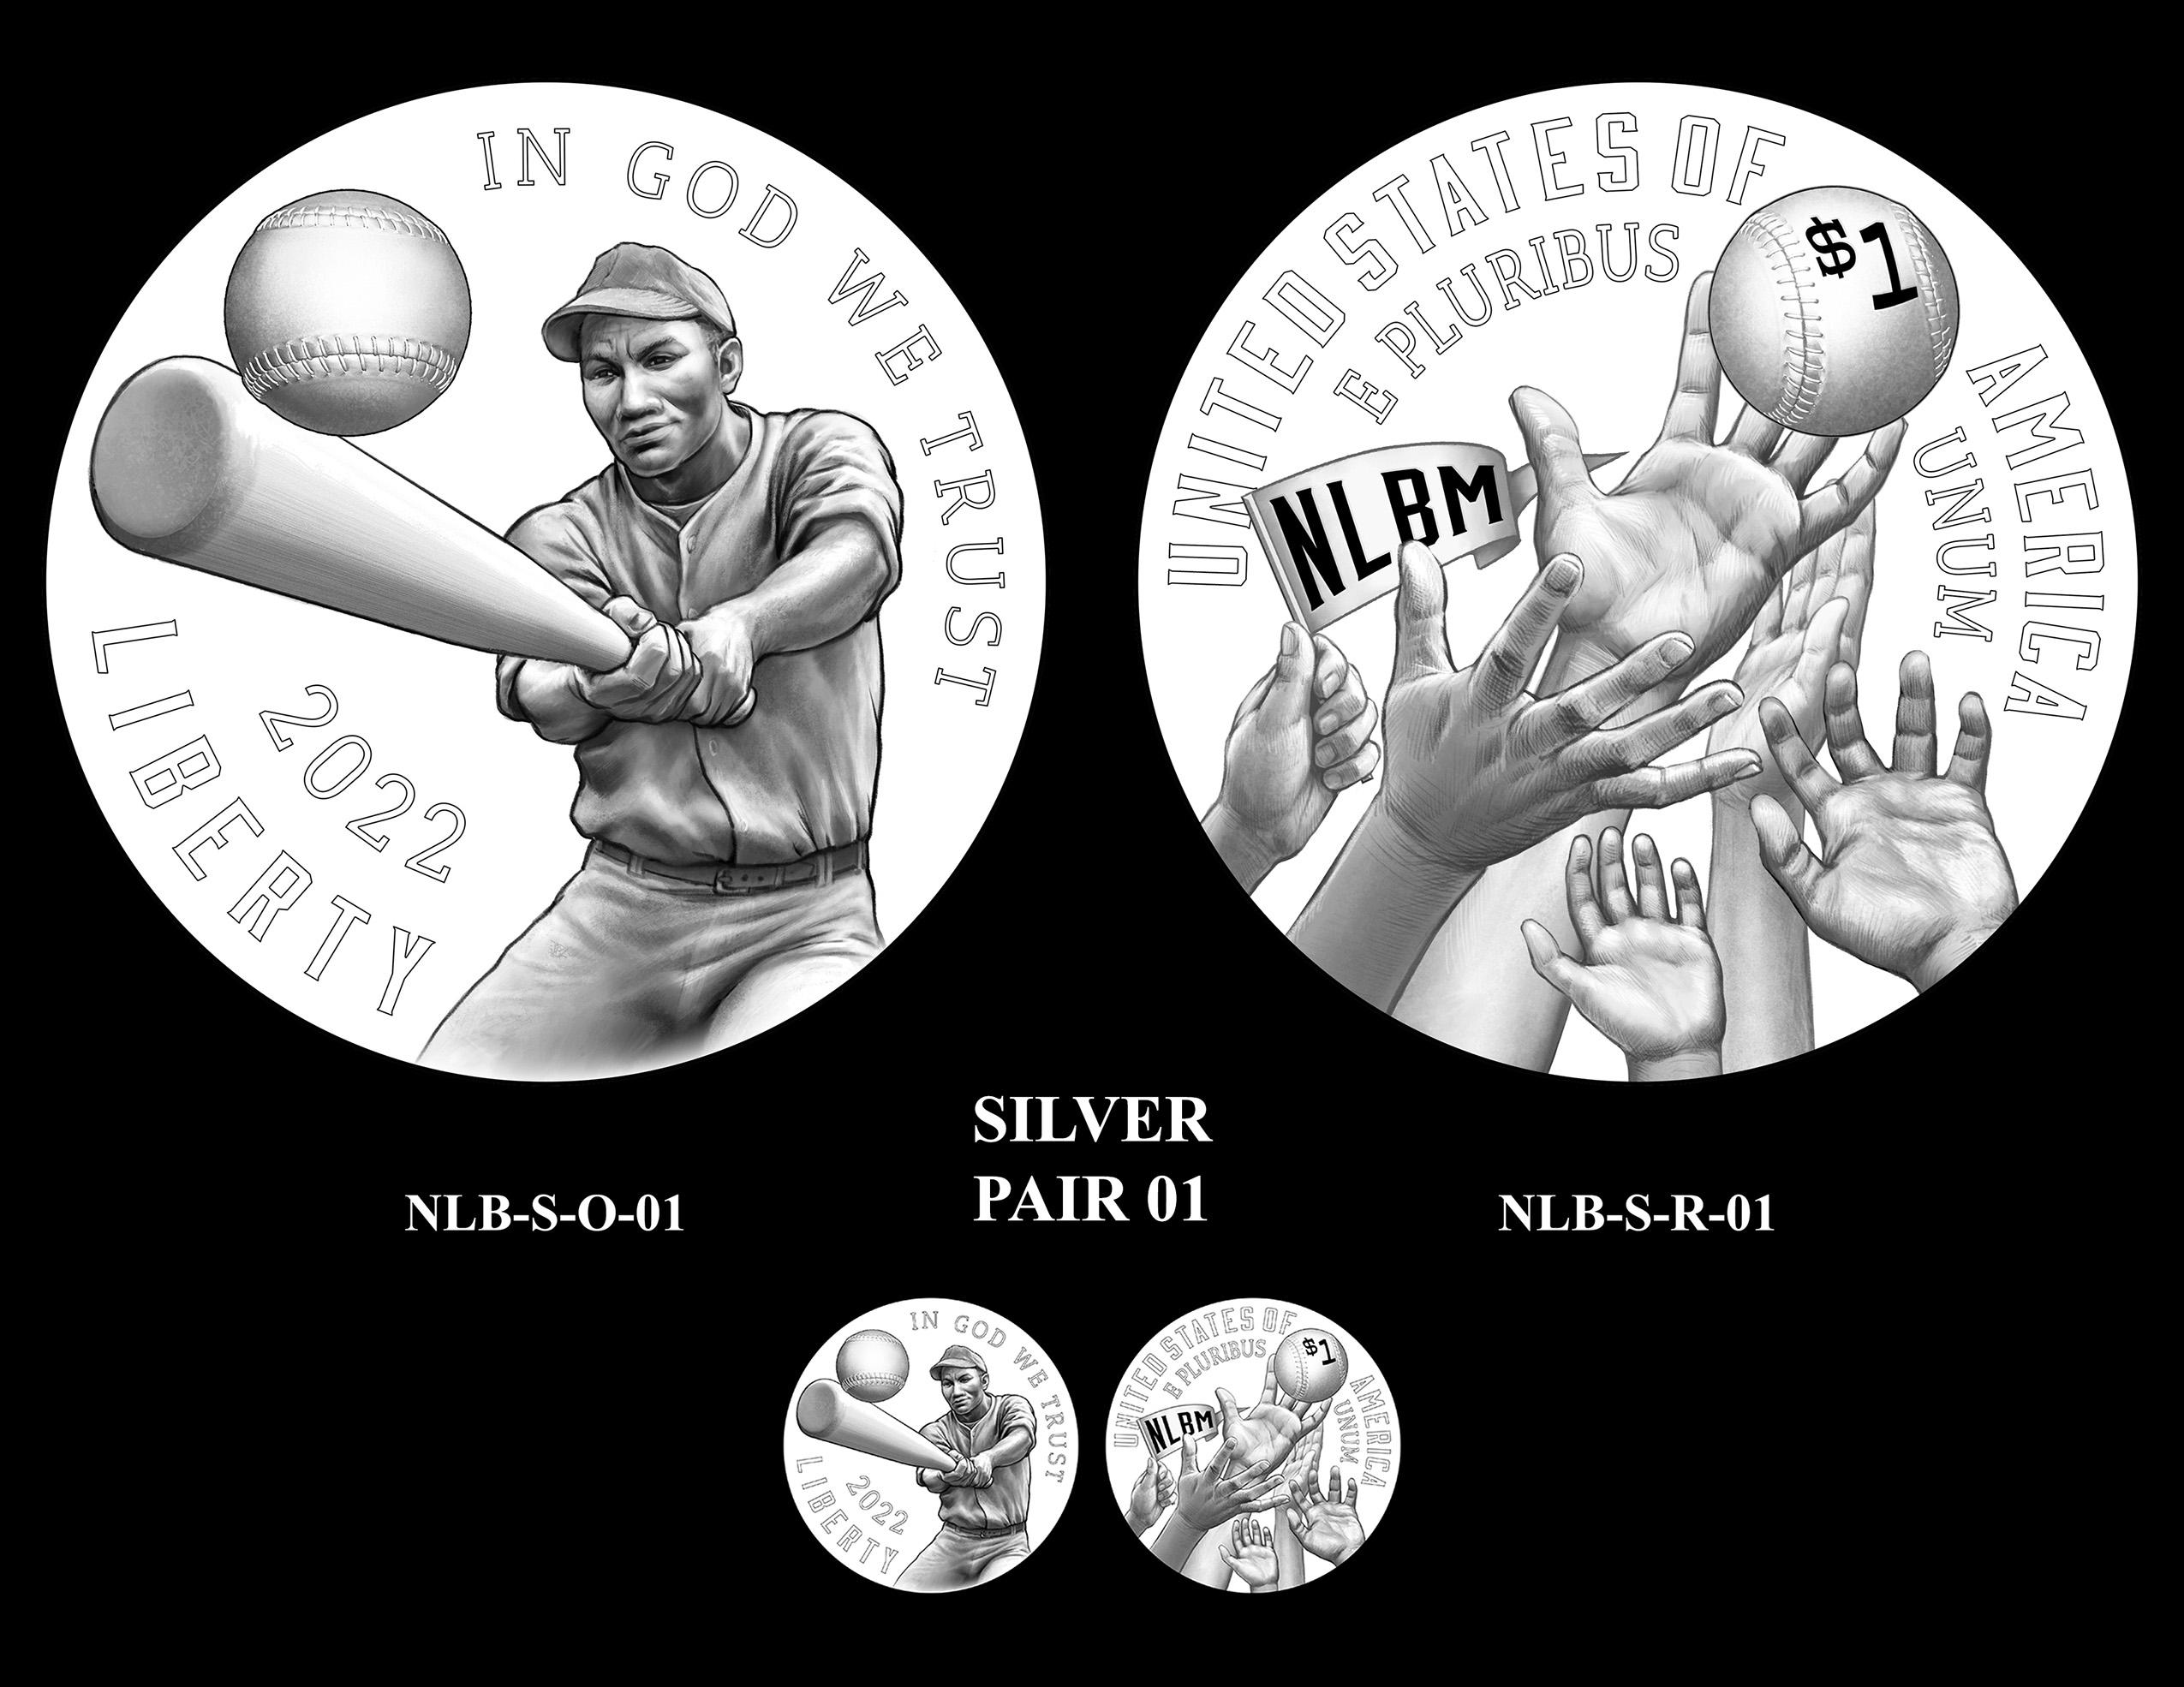 Silver Pair 01 -- Negro Leagues Baseball Commemorative Coin Program